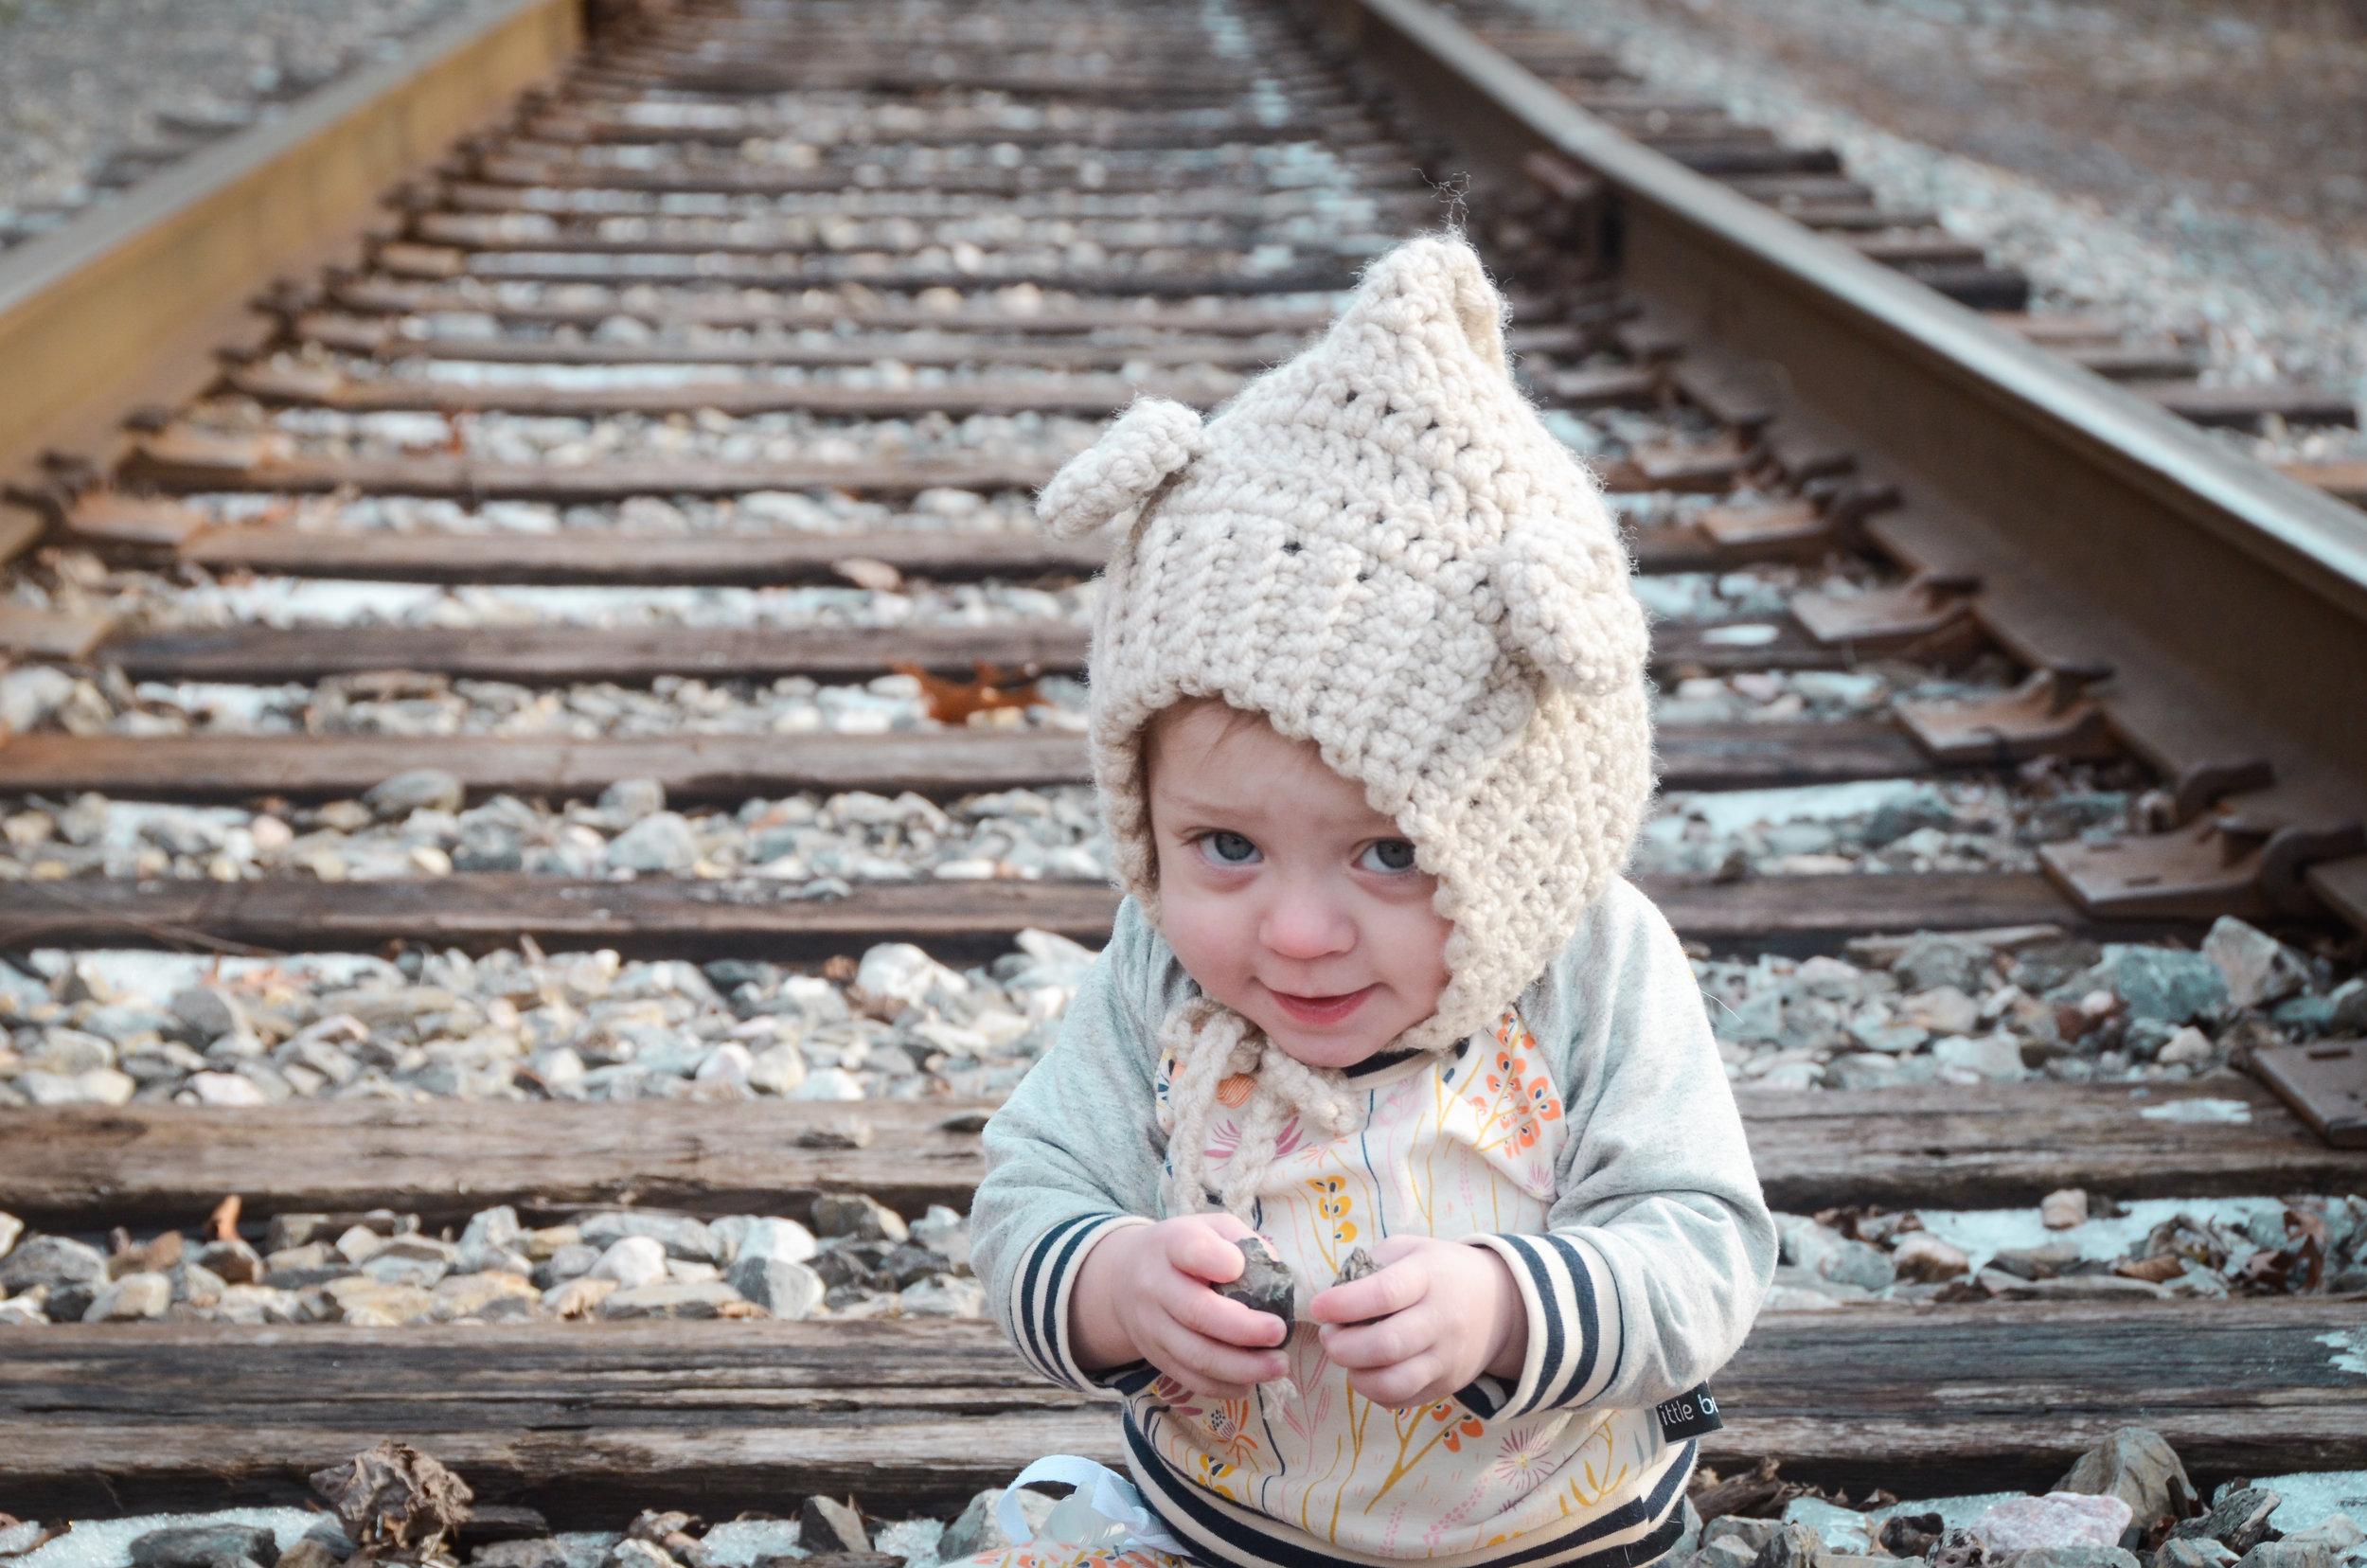 we dont tell our toddler no - shegotguts.com